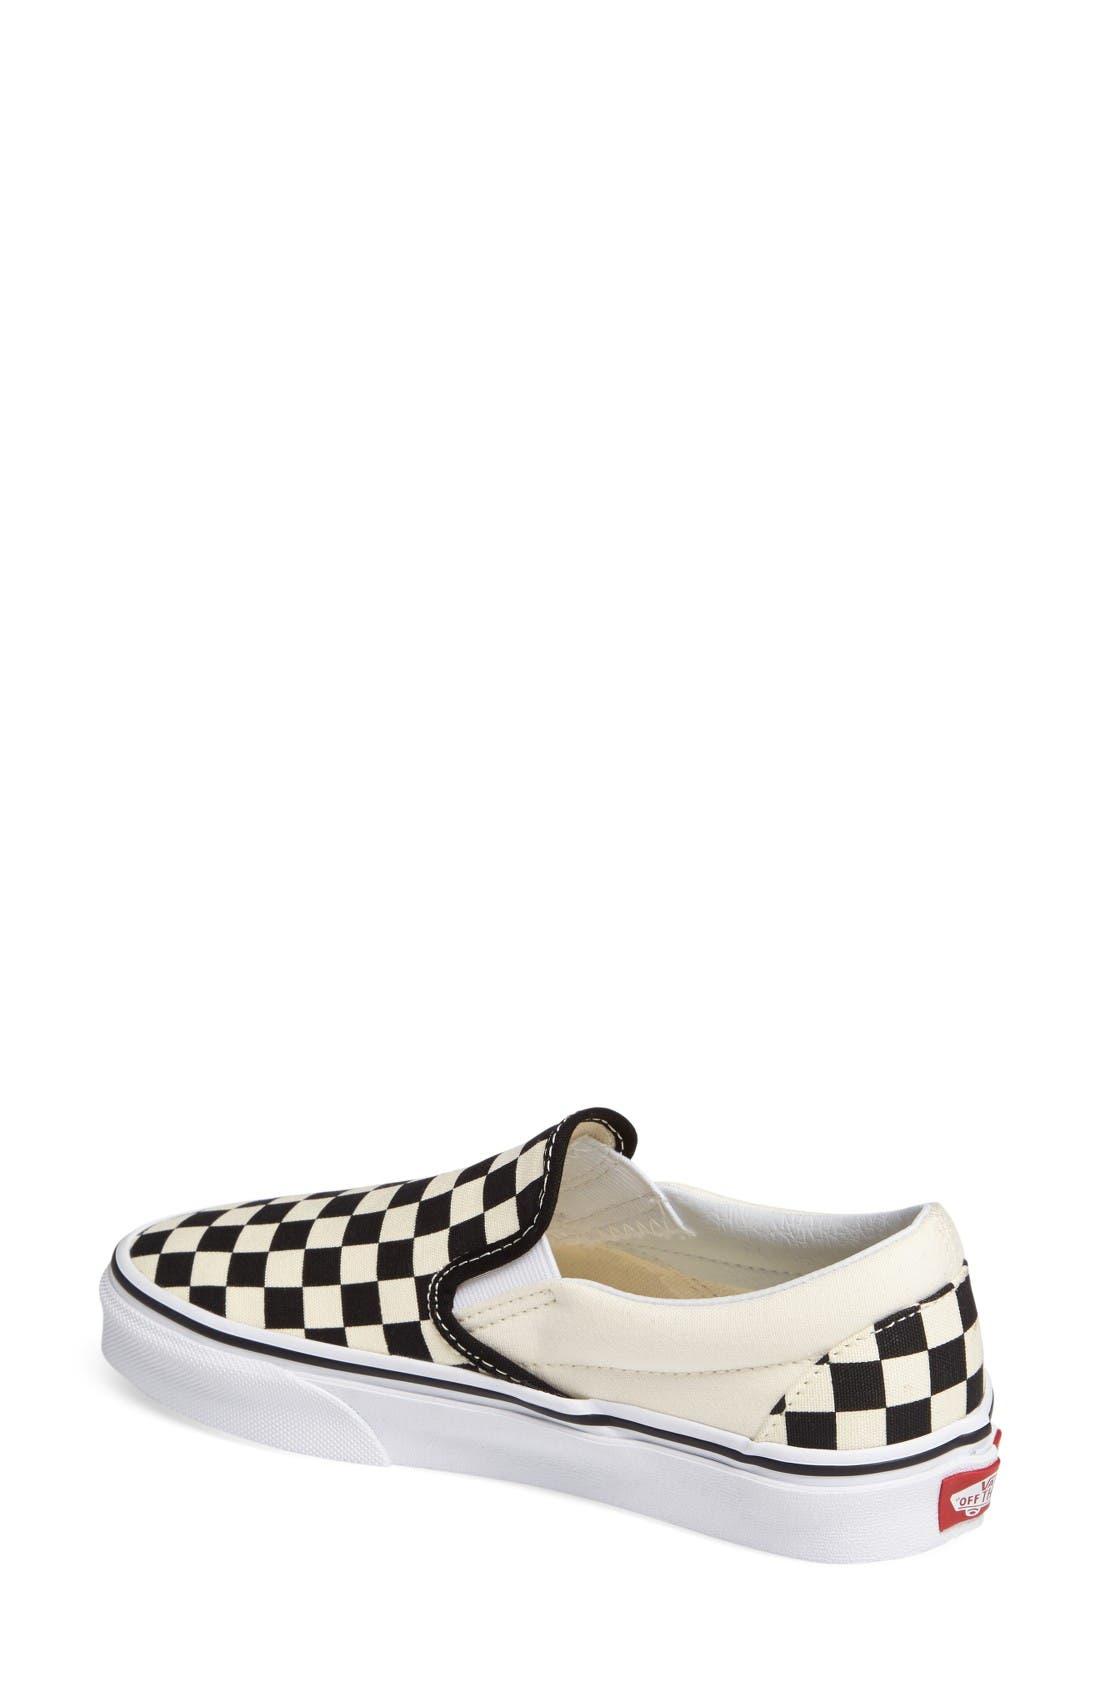 Alternate Image 2  - Vans Classic Sneaker (Women)